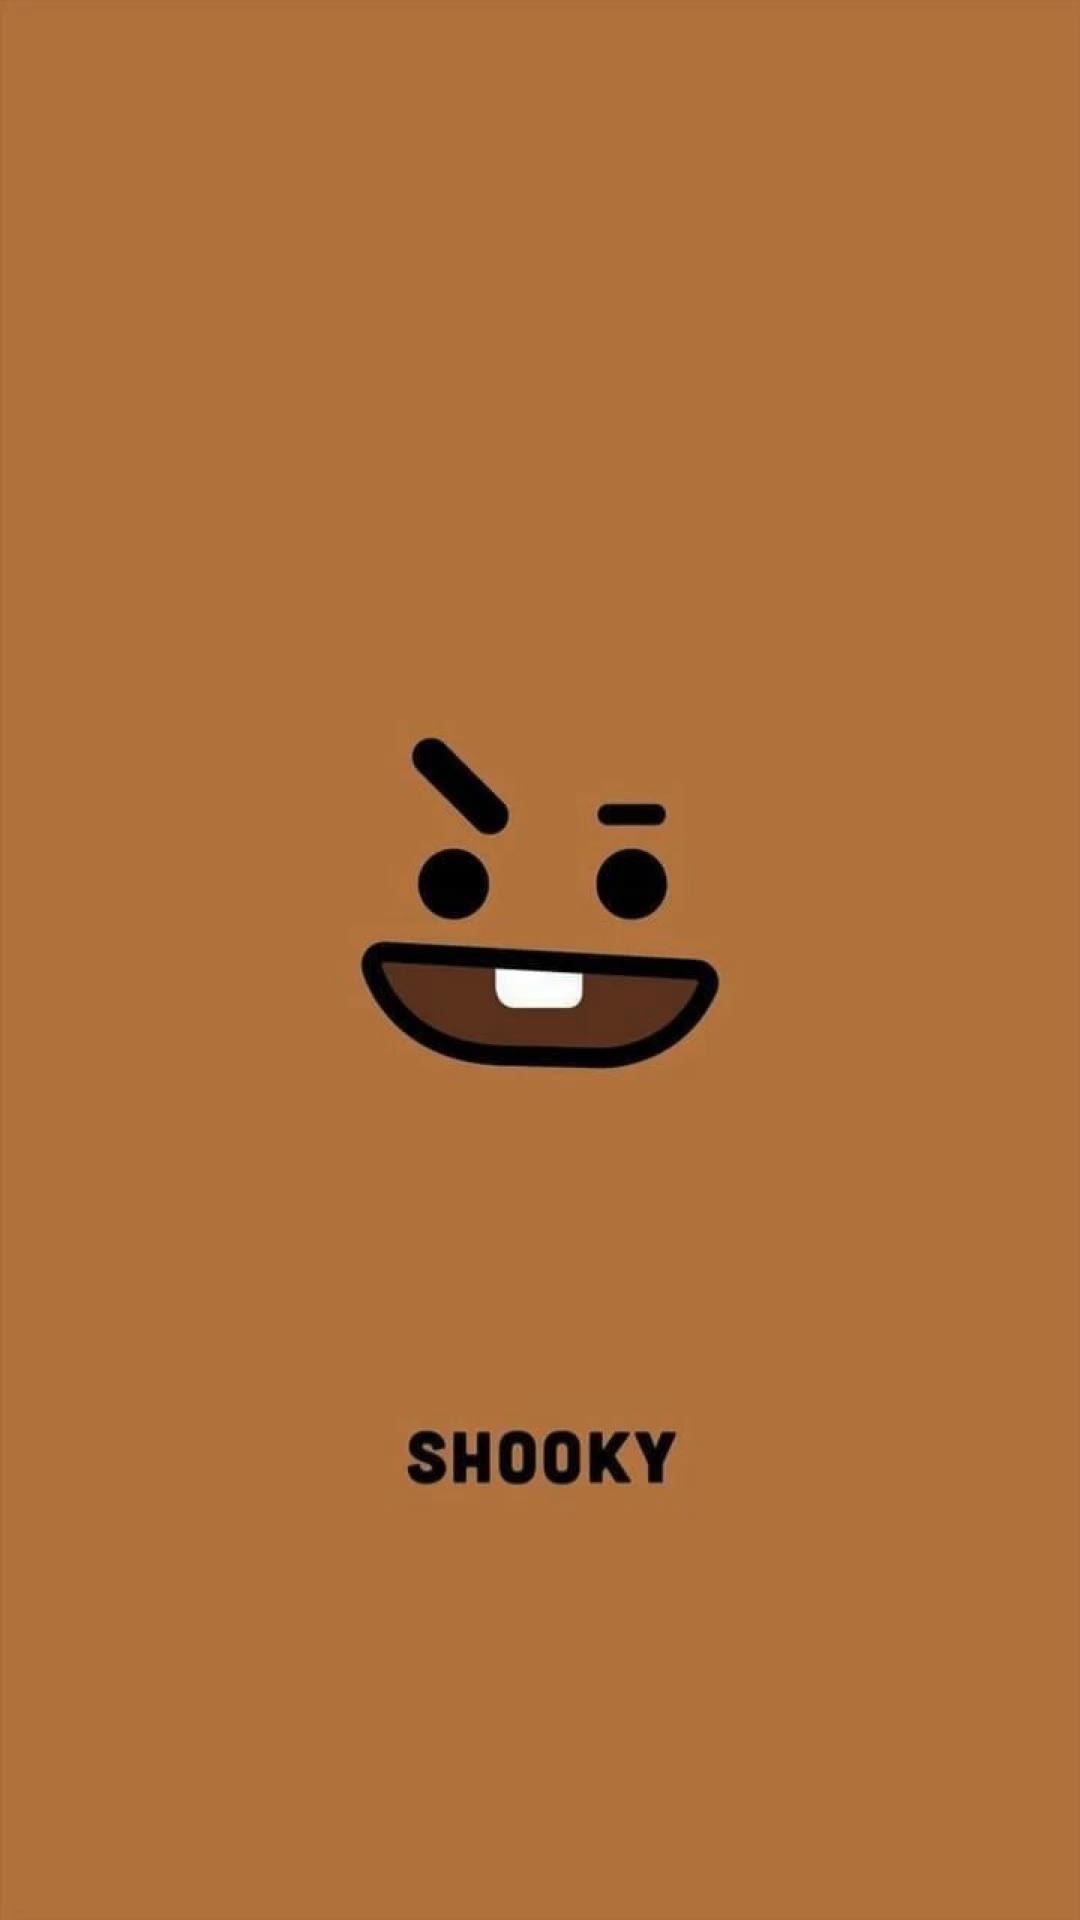 Tata & shooky